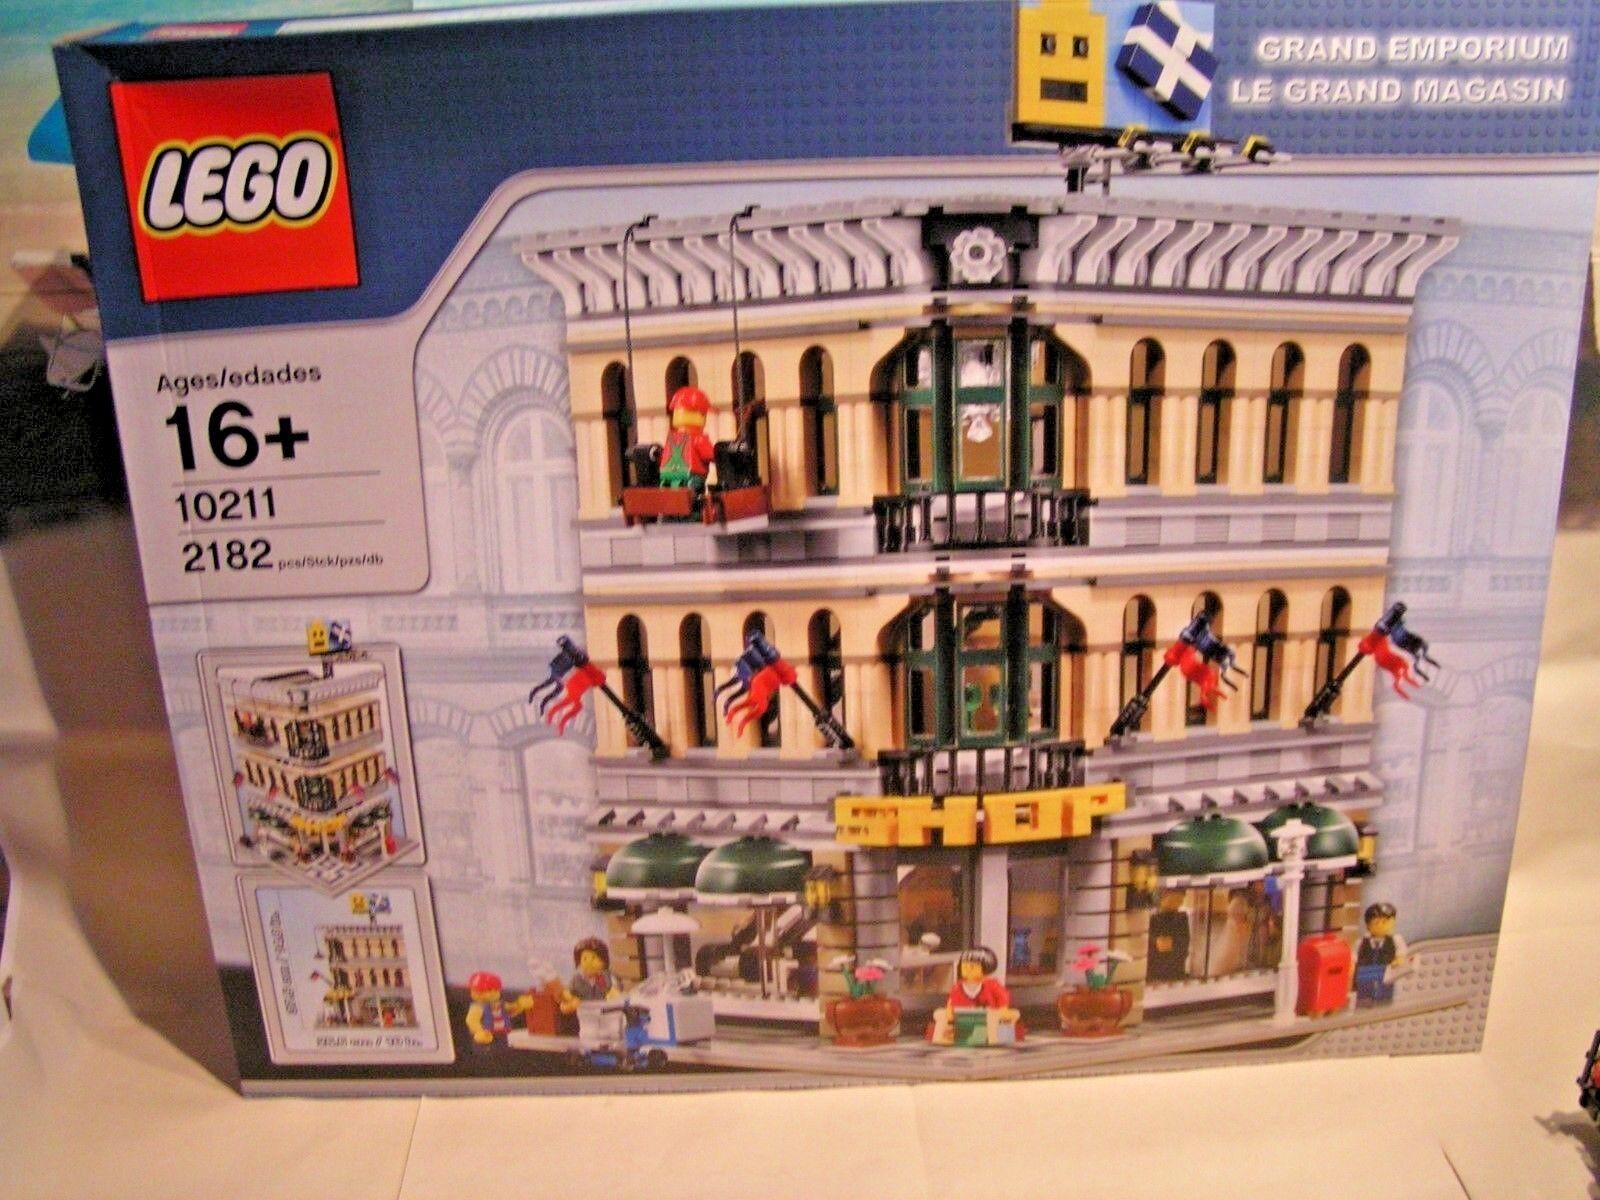 LEGO TOWN  -  GRAND EMPORIUM - LE GRAND MAGASIN  ref. 10211